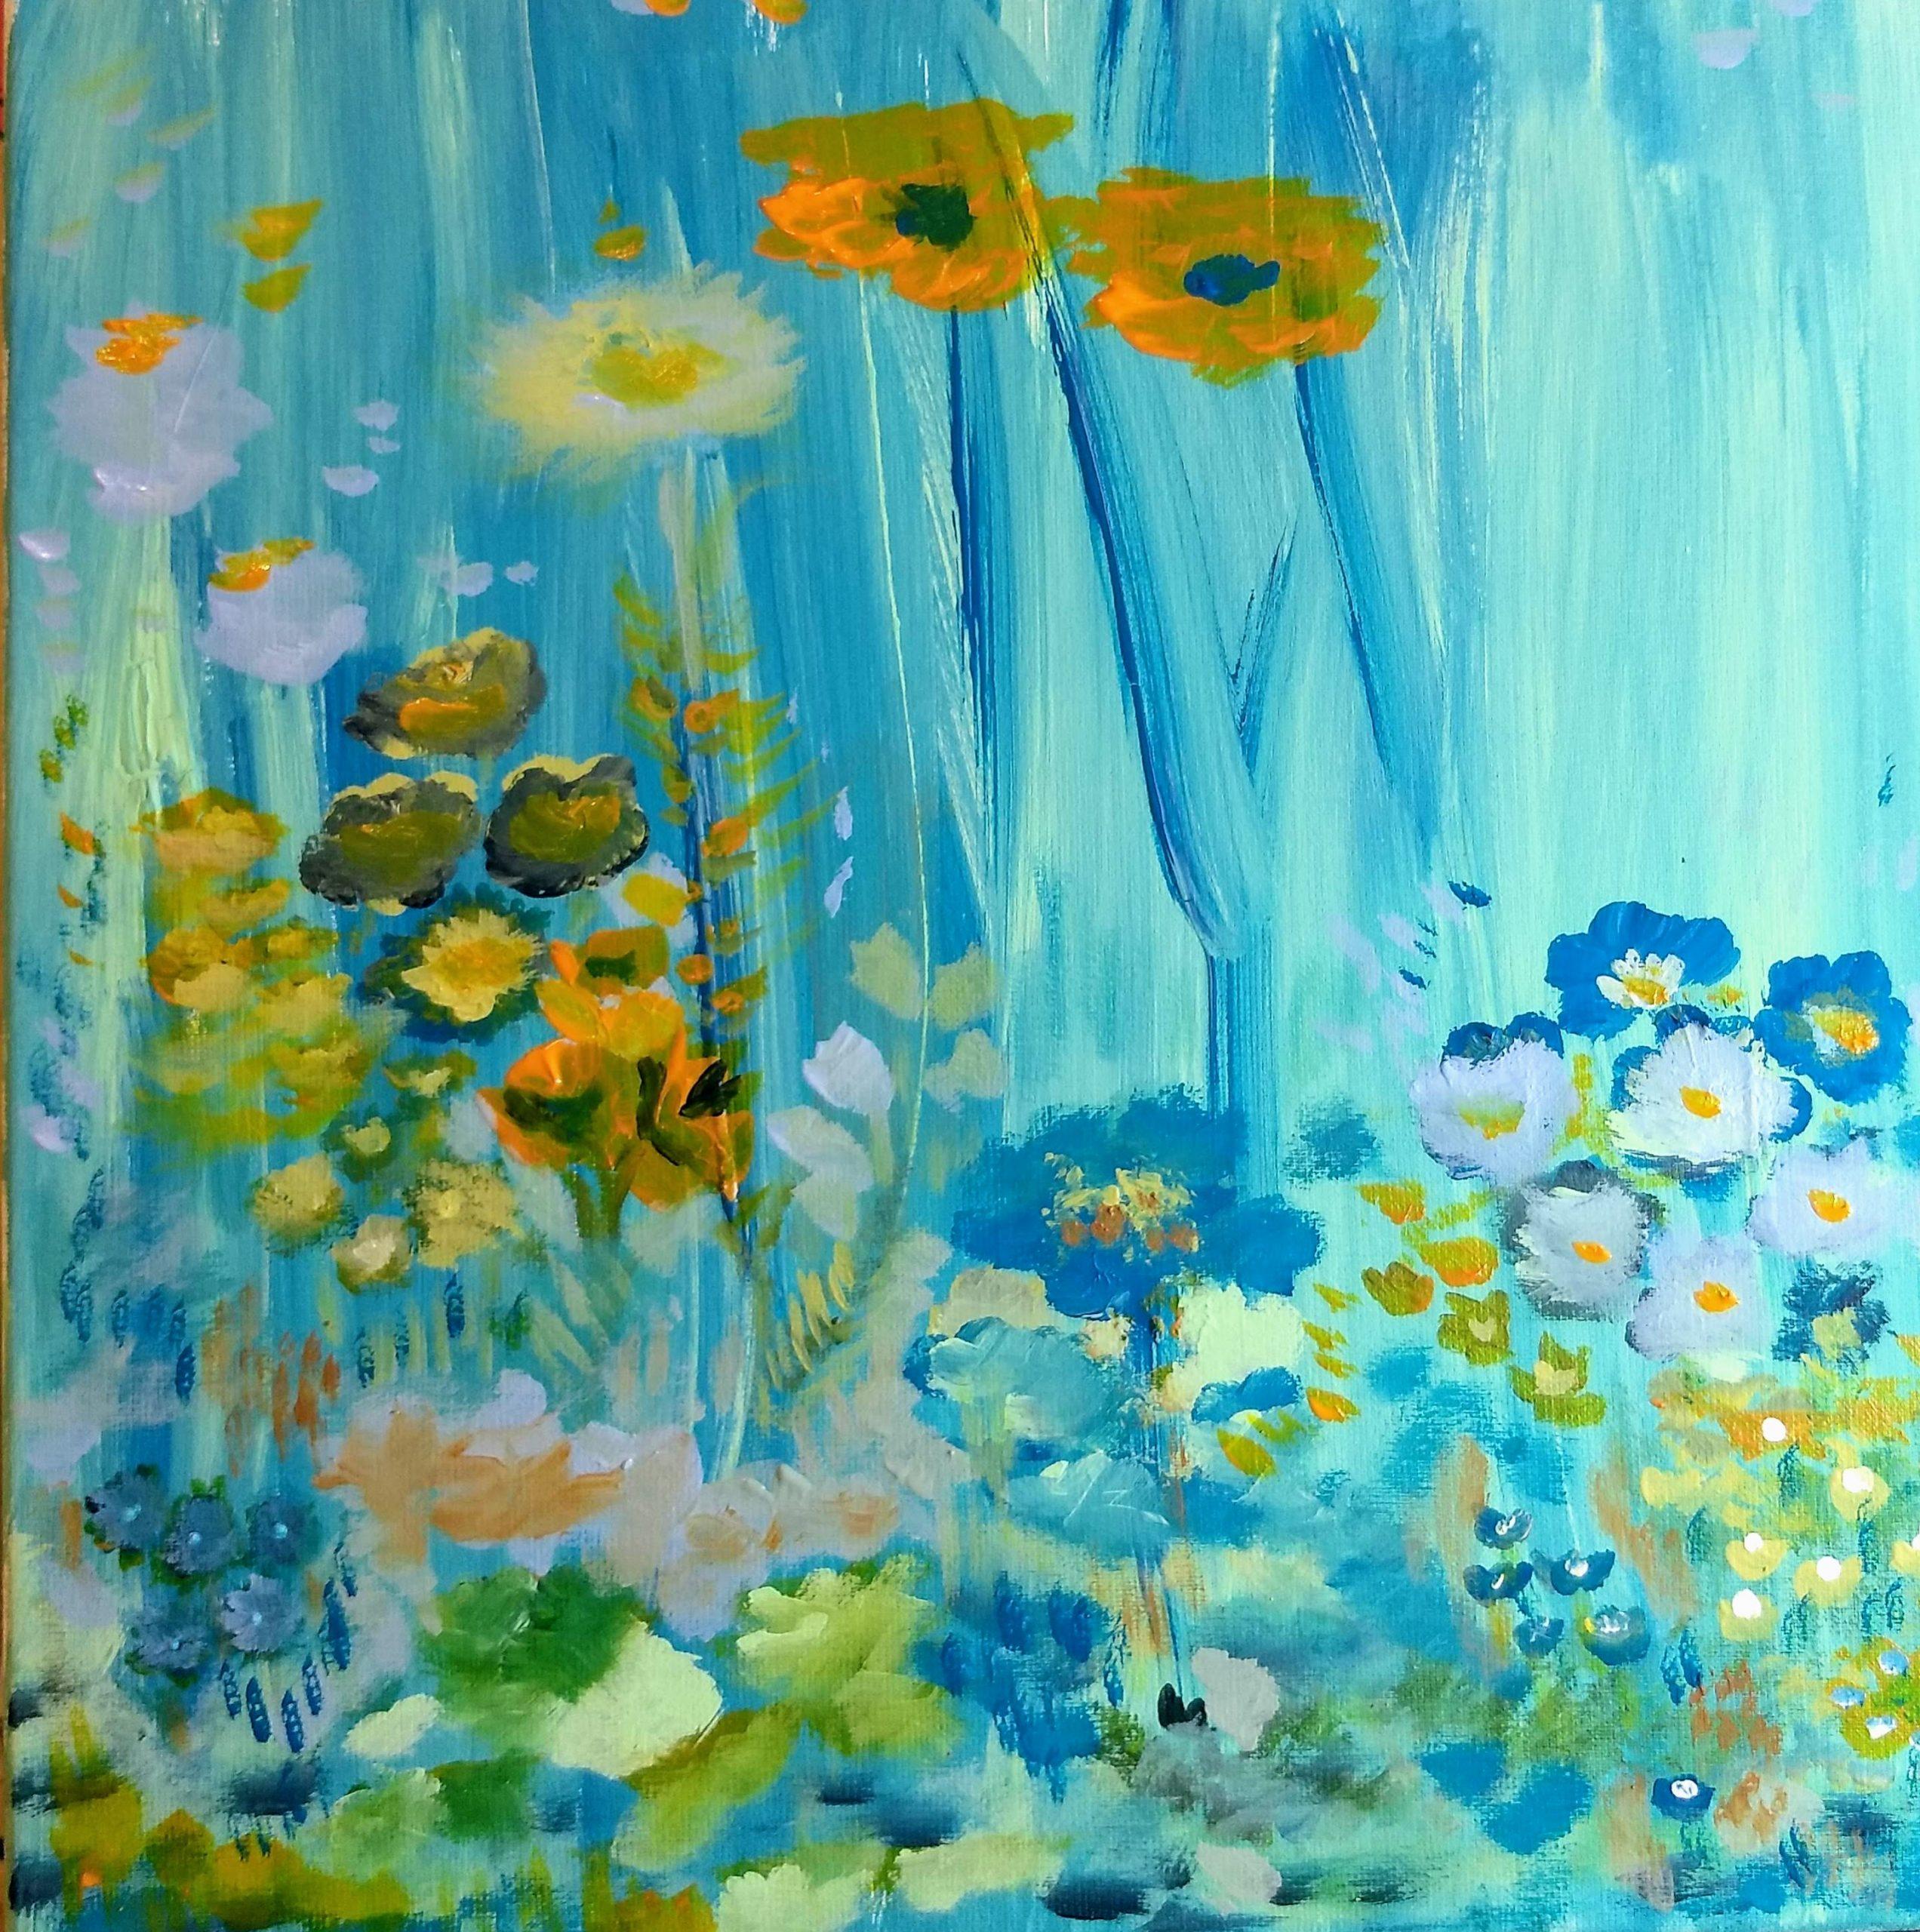 Silvia Portaluppi | Serie Natural. En el fondo del mar. Acrílico 40 x 40 cm.